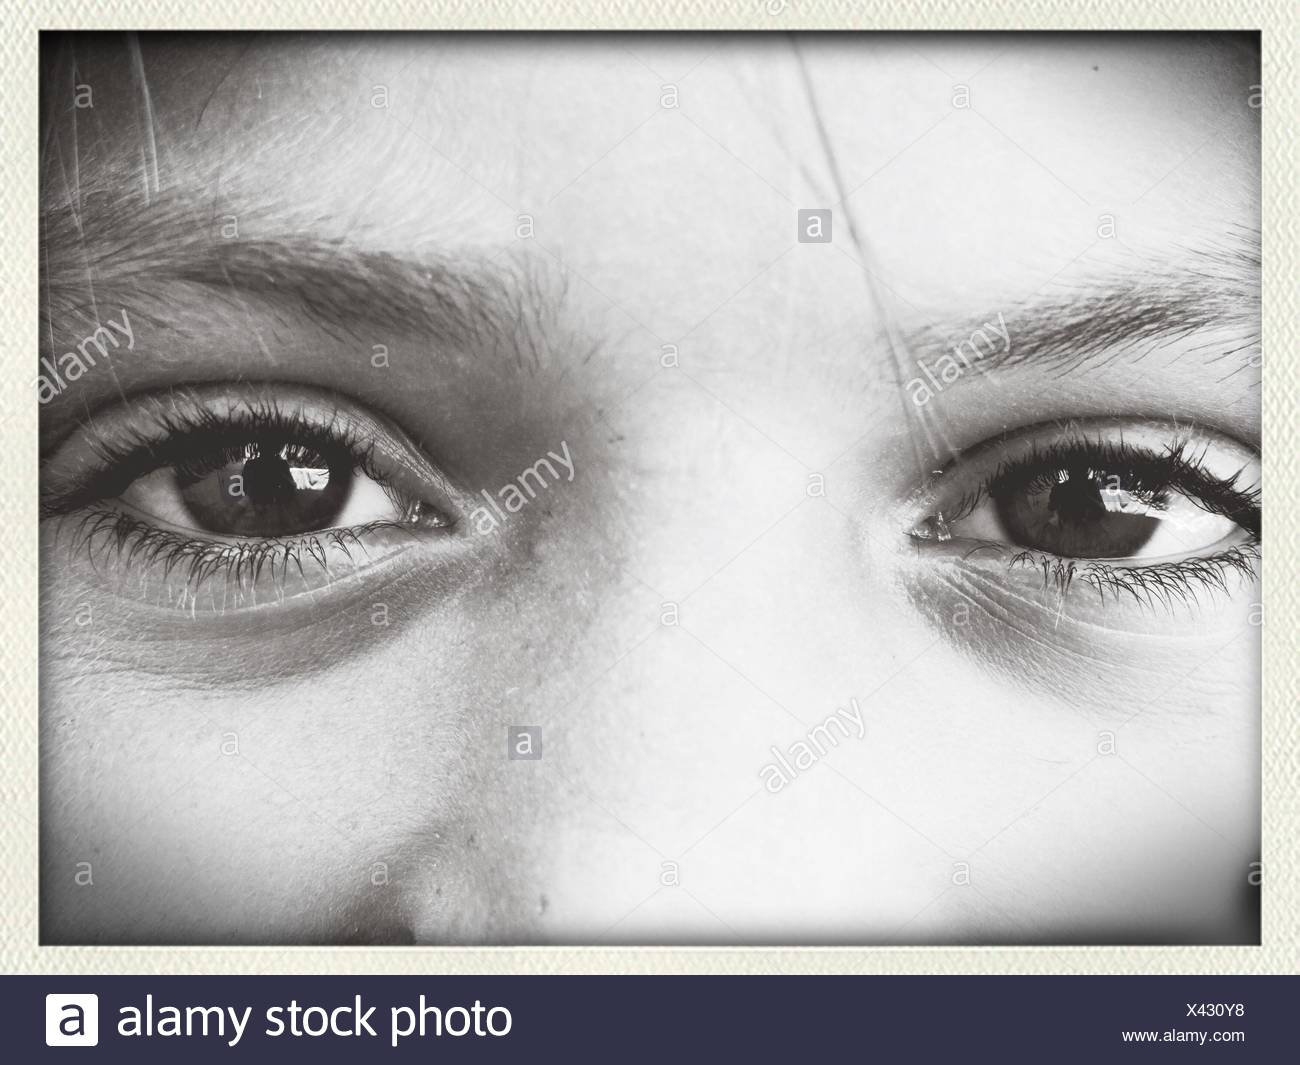 Detail Shot Of Human Eyes And Brows - Stock Image